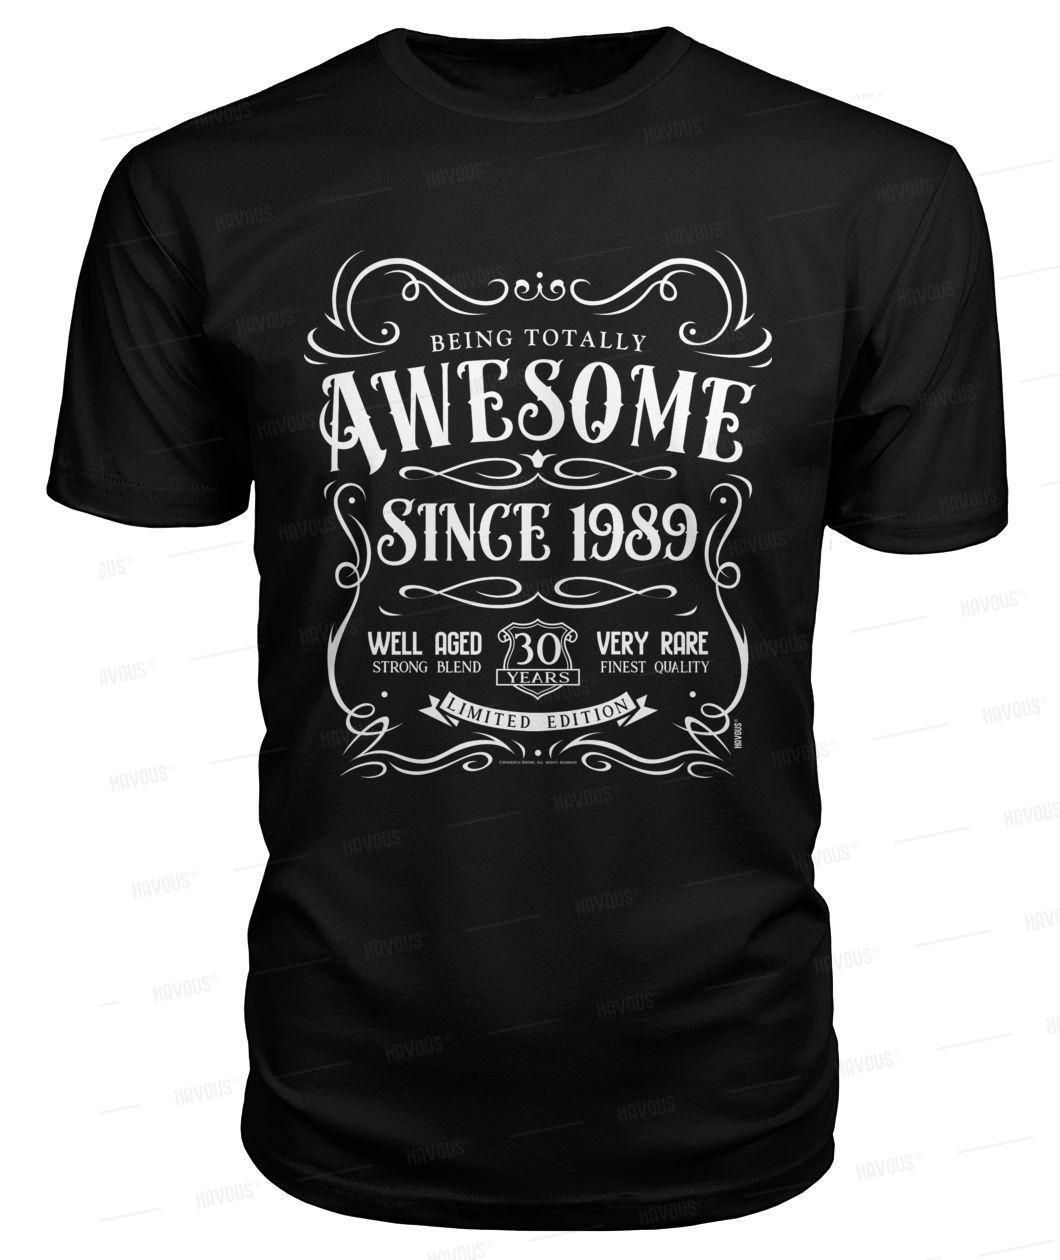 30th birthday gift tshirt awesome since 1989 30th